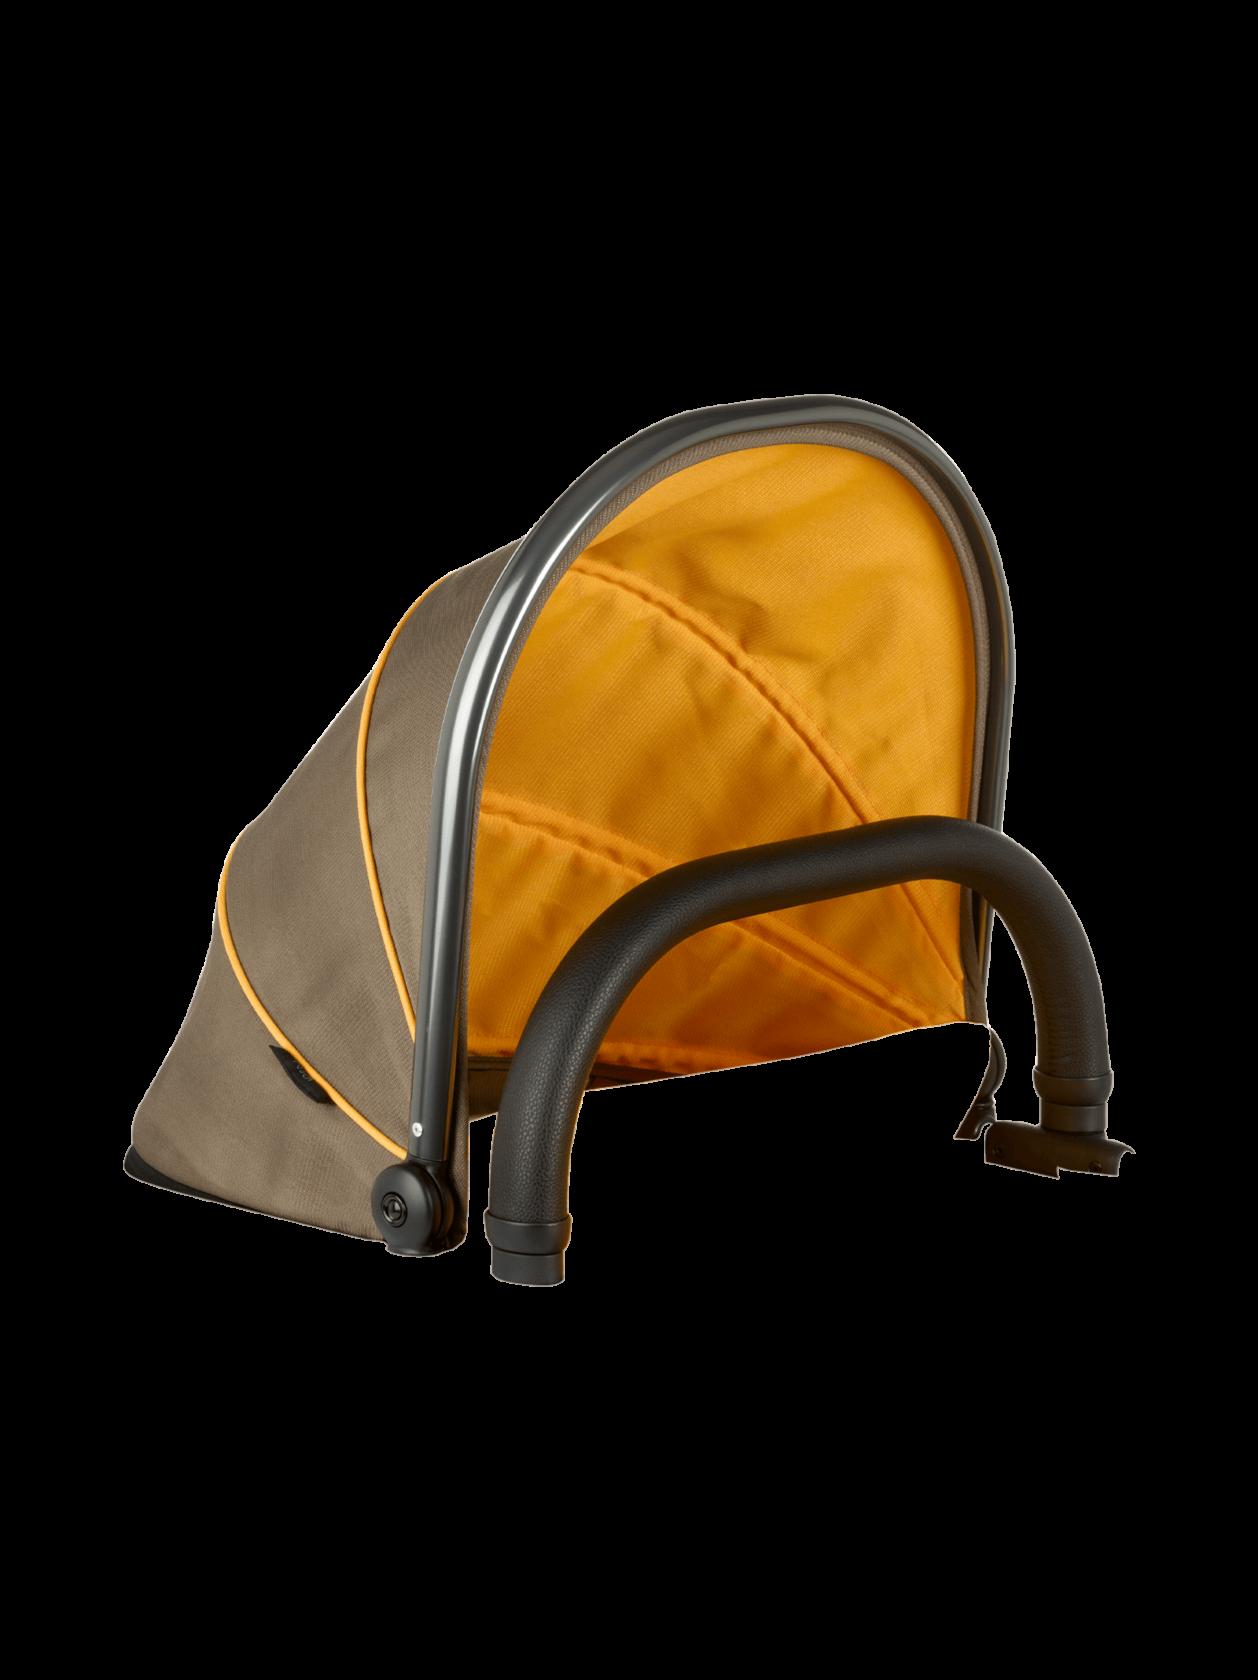 Peach Main Carrycot Honeybomb Companion